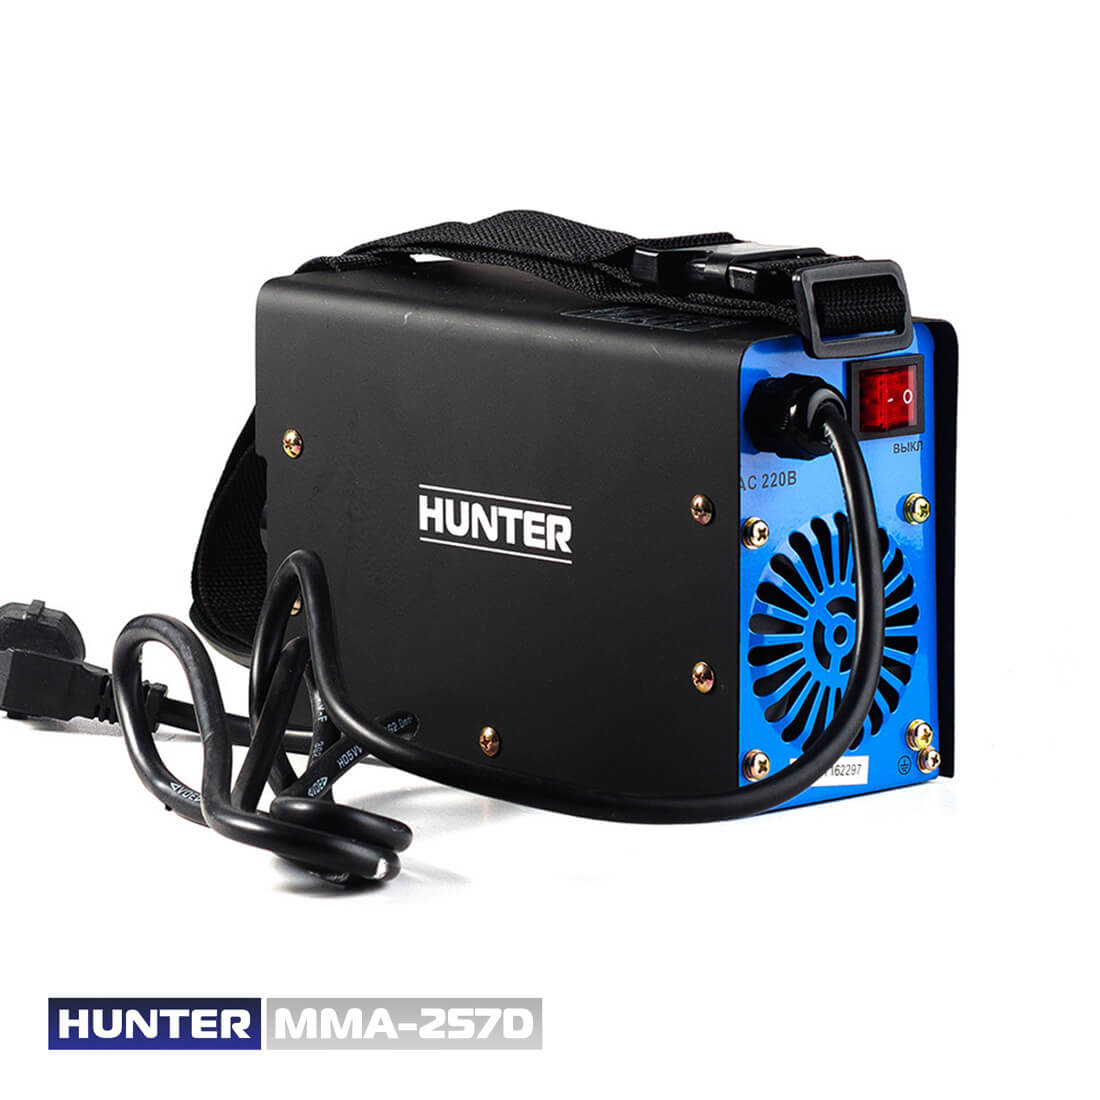 Фото Hunter MMA 257D (дуговая) цена 2250грн №4 — Hunter